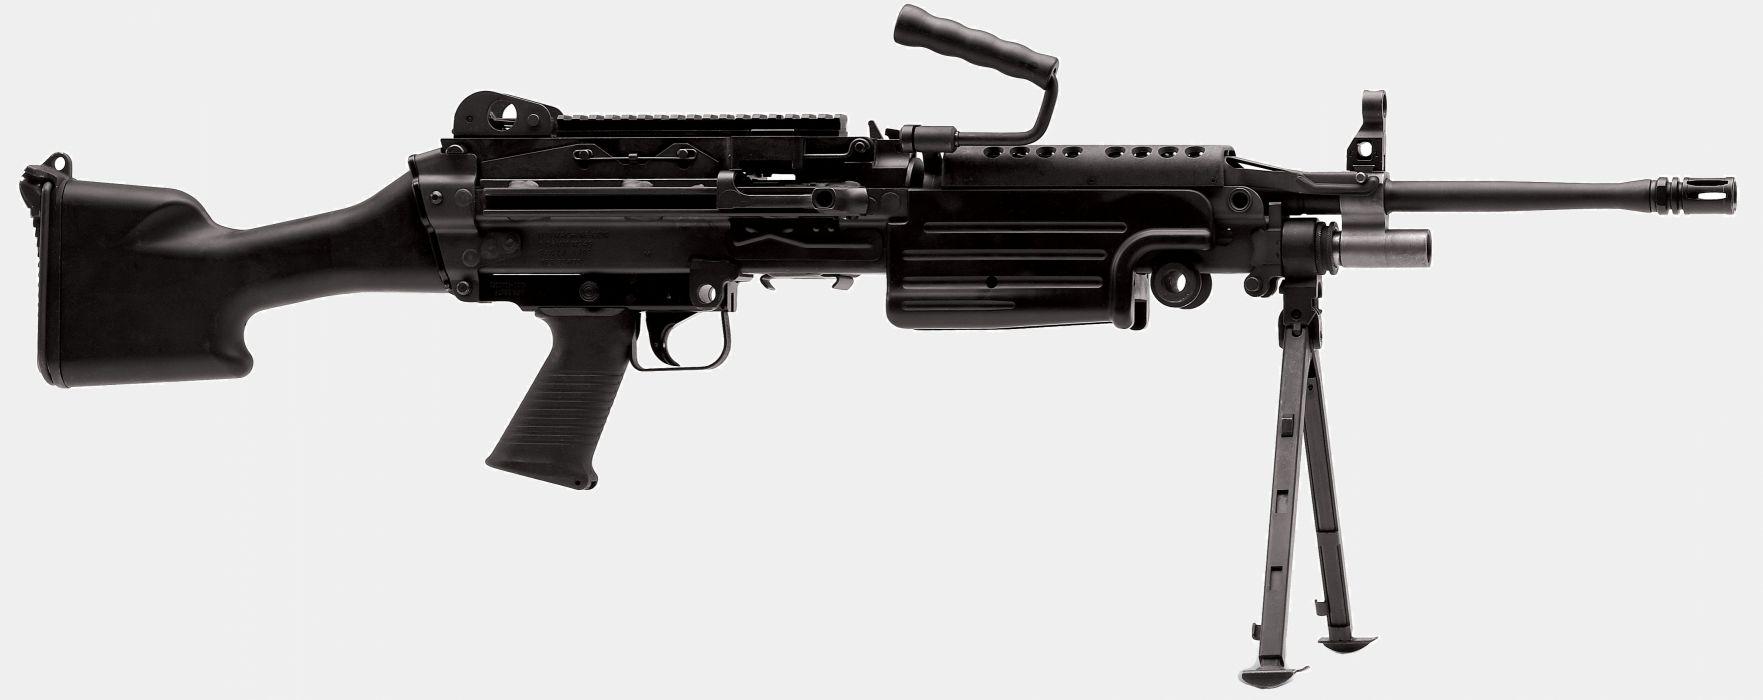 M249 SAW machine weapon gun military    f wallpaper